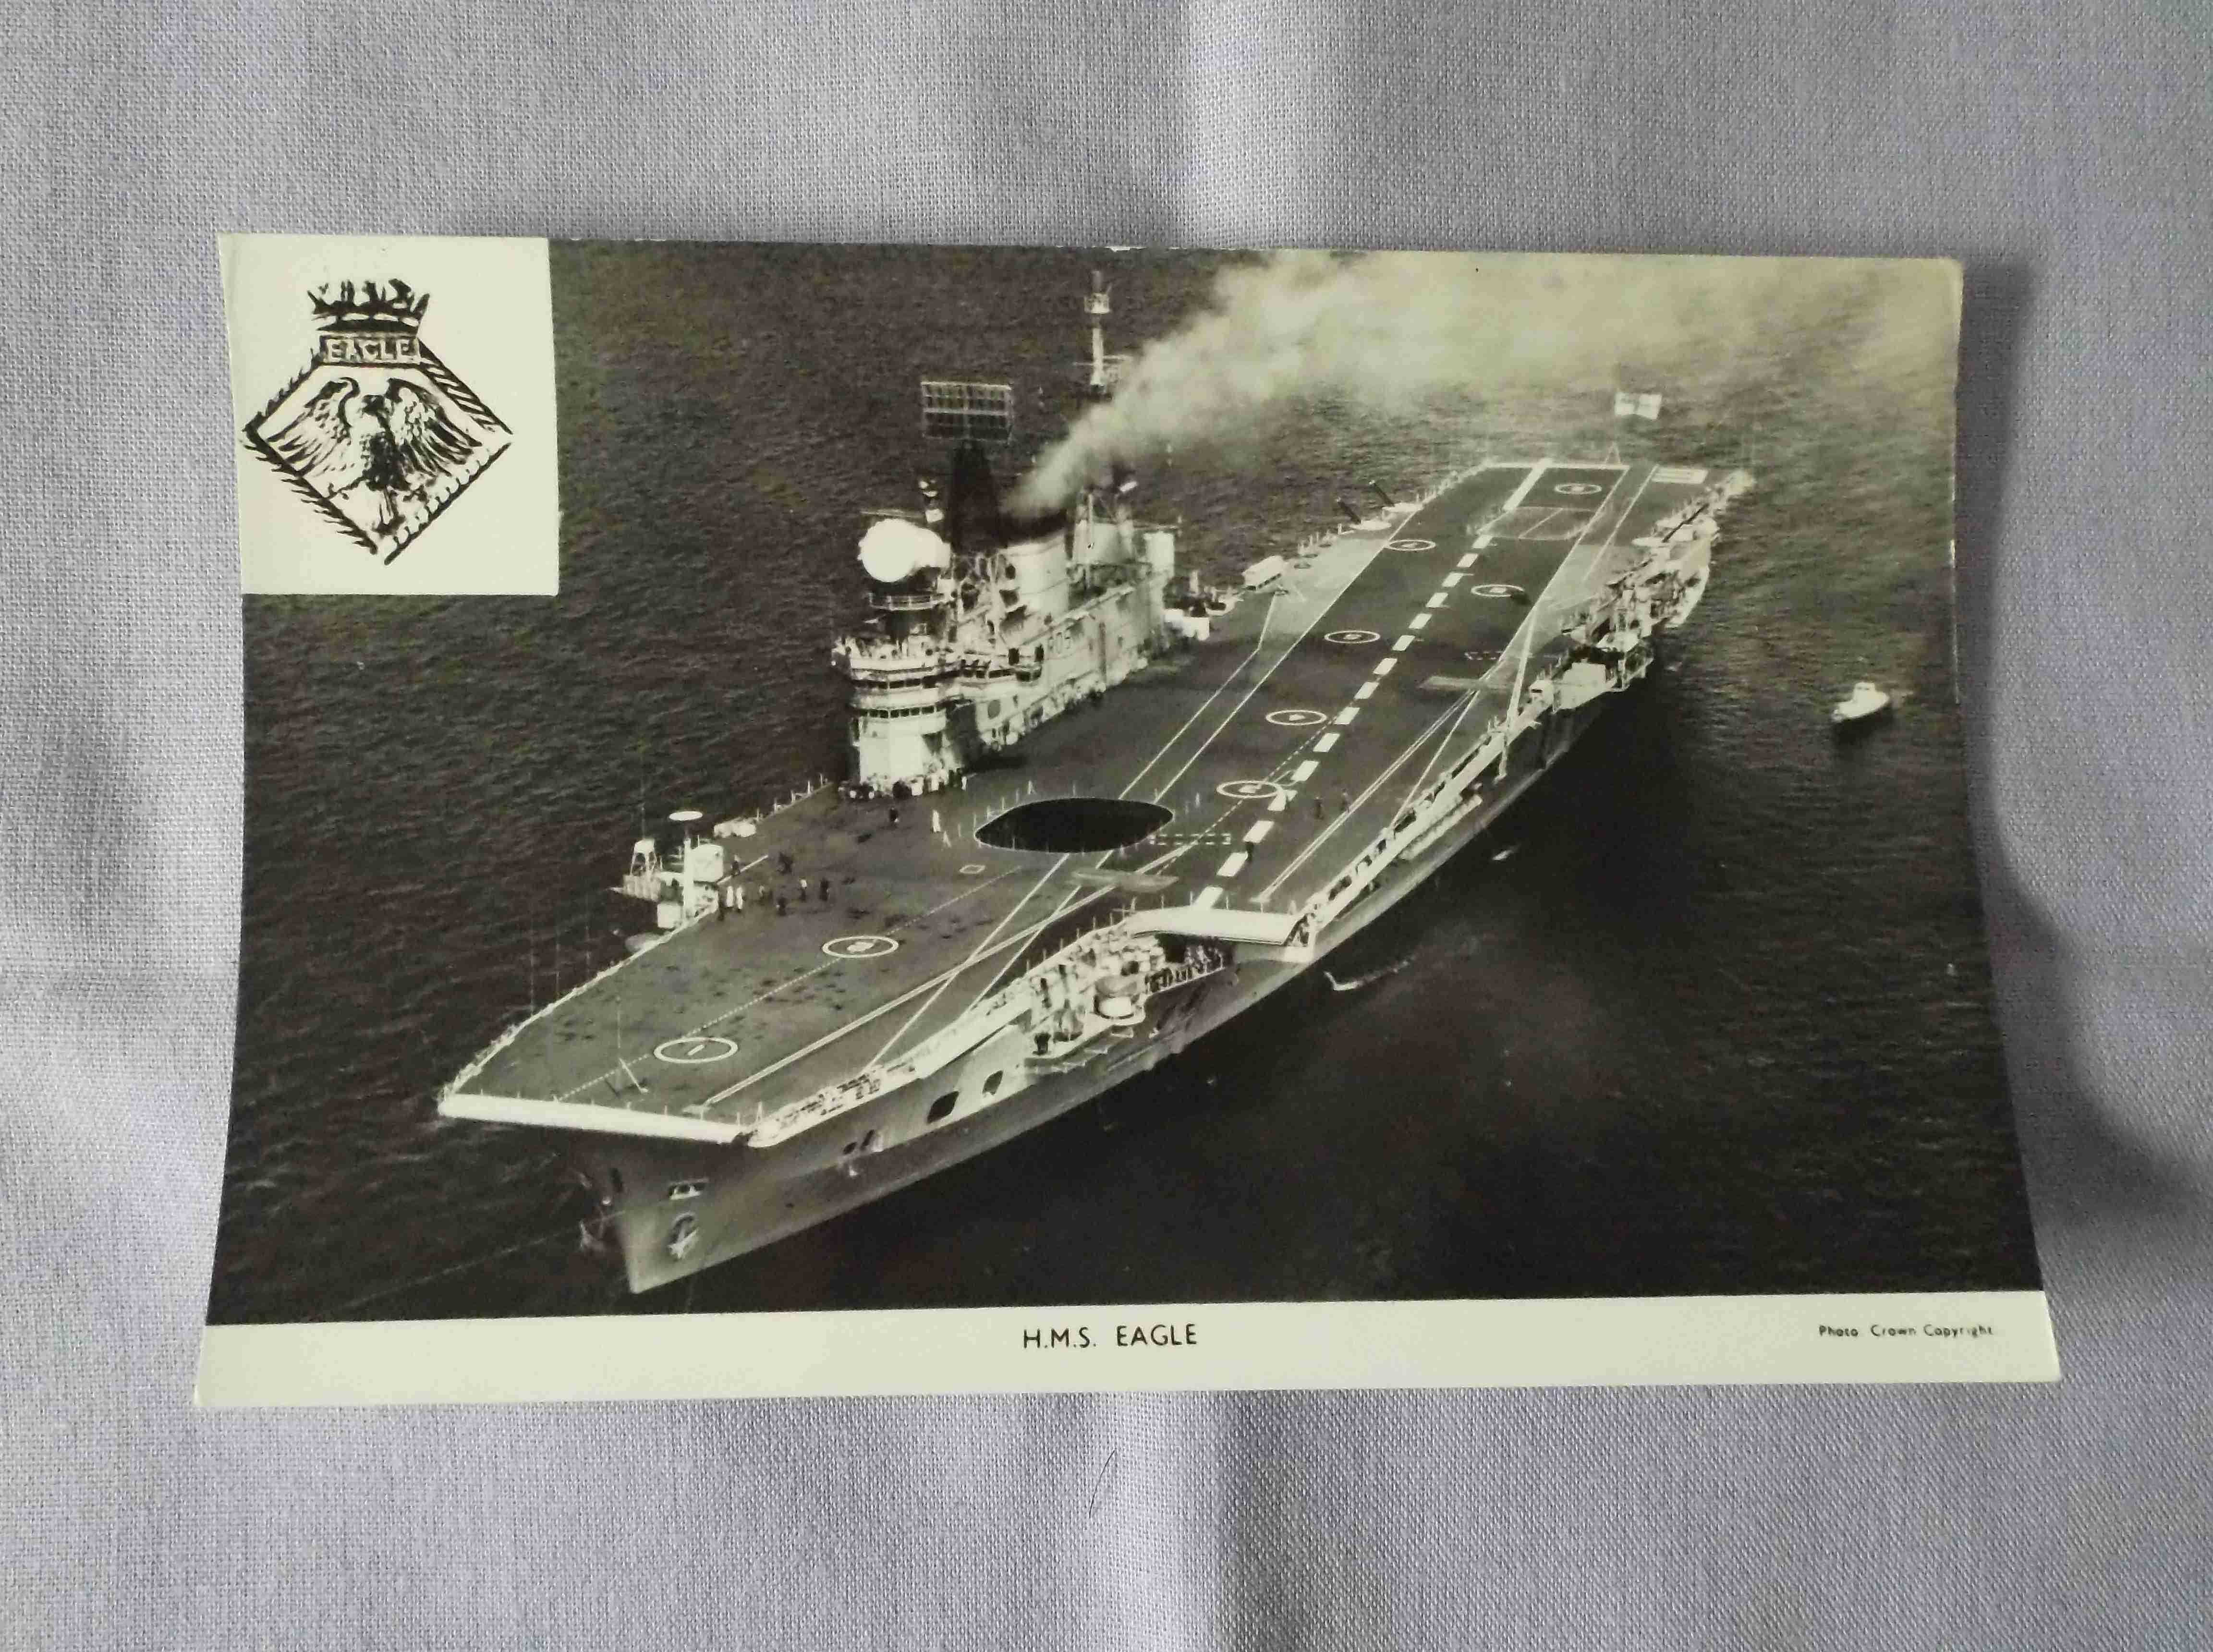 POSTCARD SIZE PHOTOGRAPH OF THE ROYAL NAVAL VESSEL HMS EAGLE